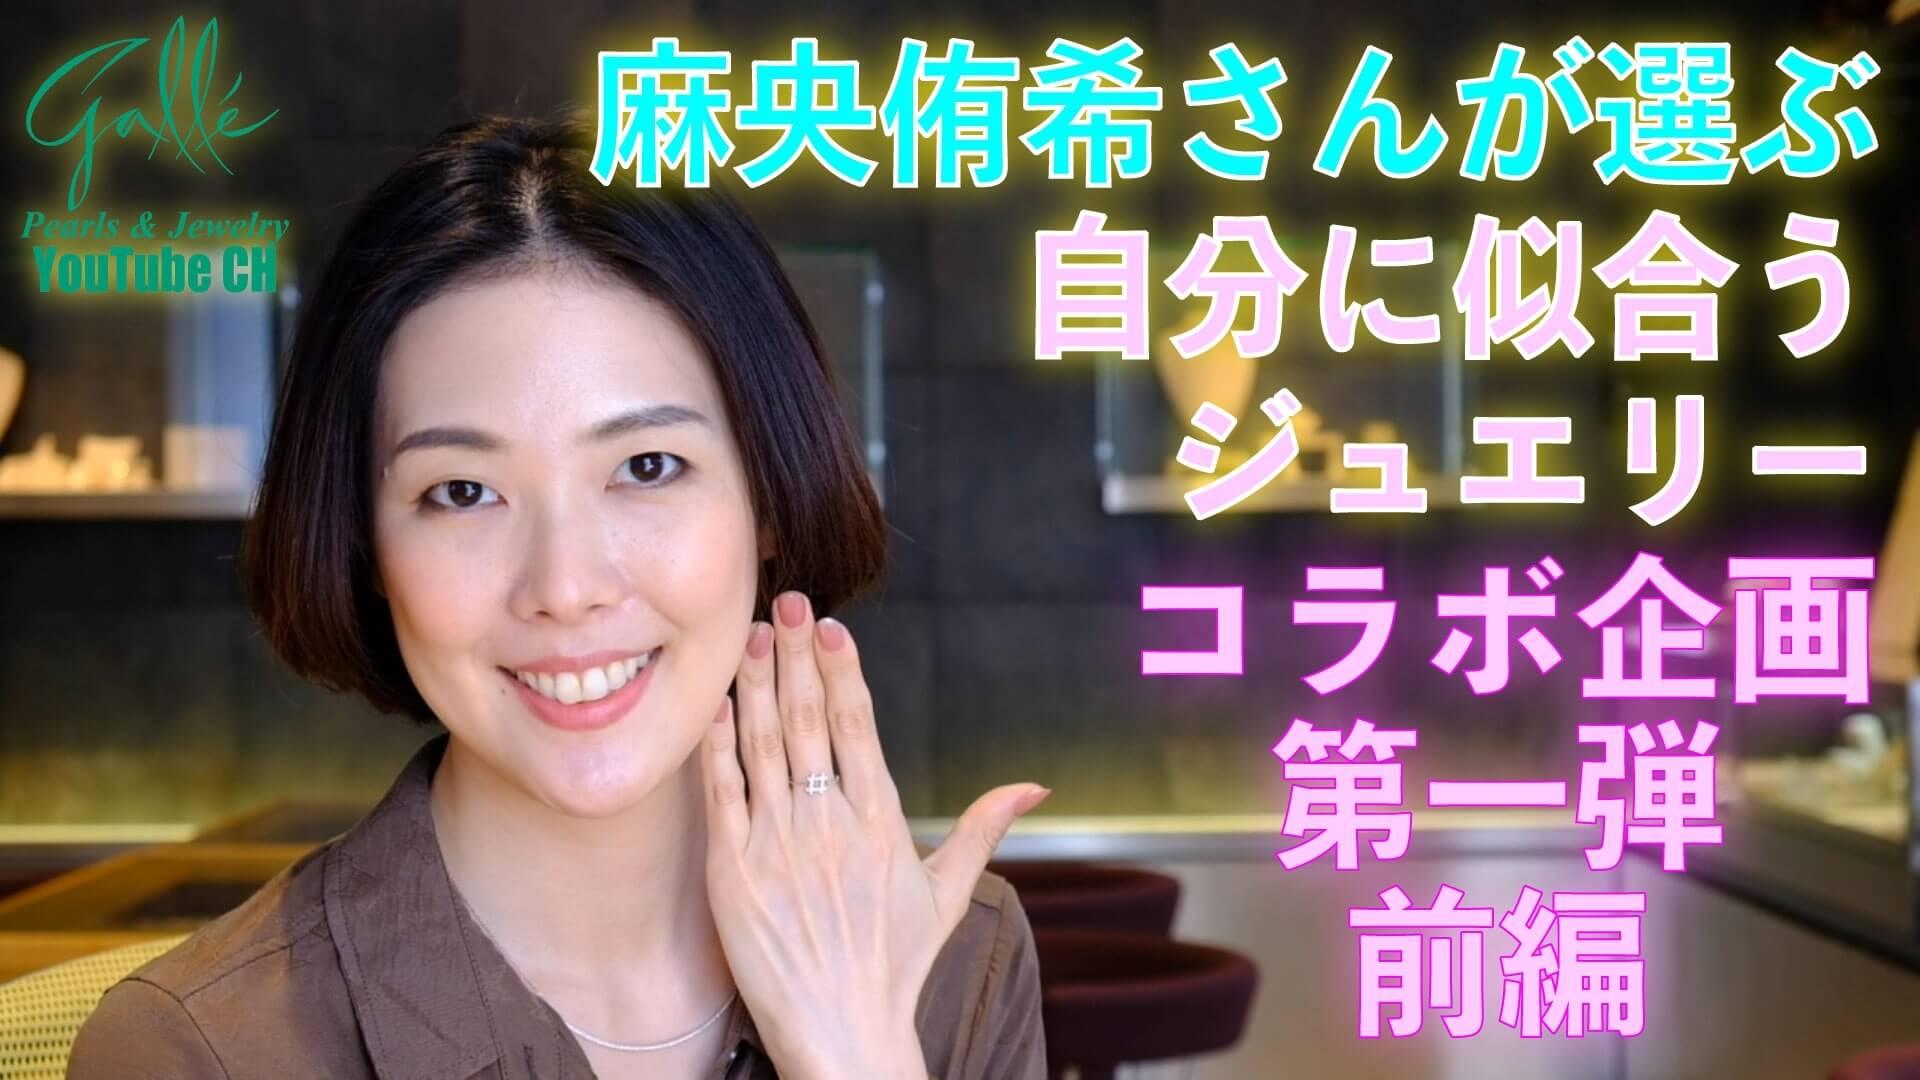 Galle × 麻央侑希さん YouTubeコラボ企画第一弾前編